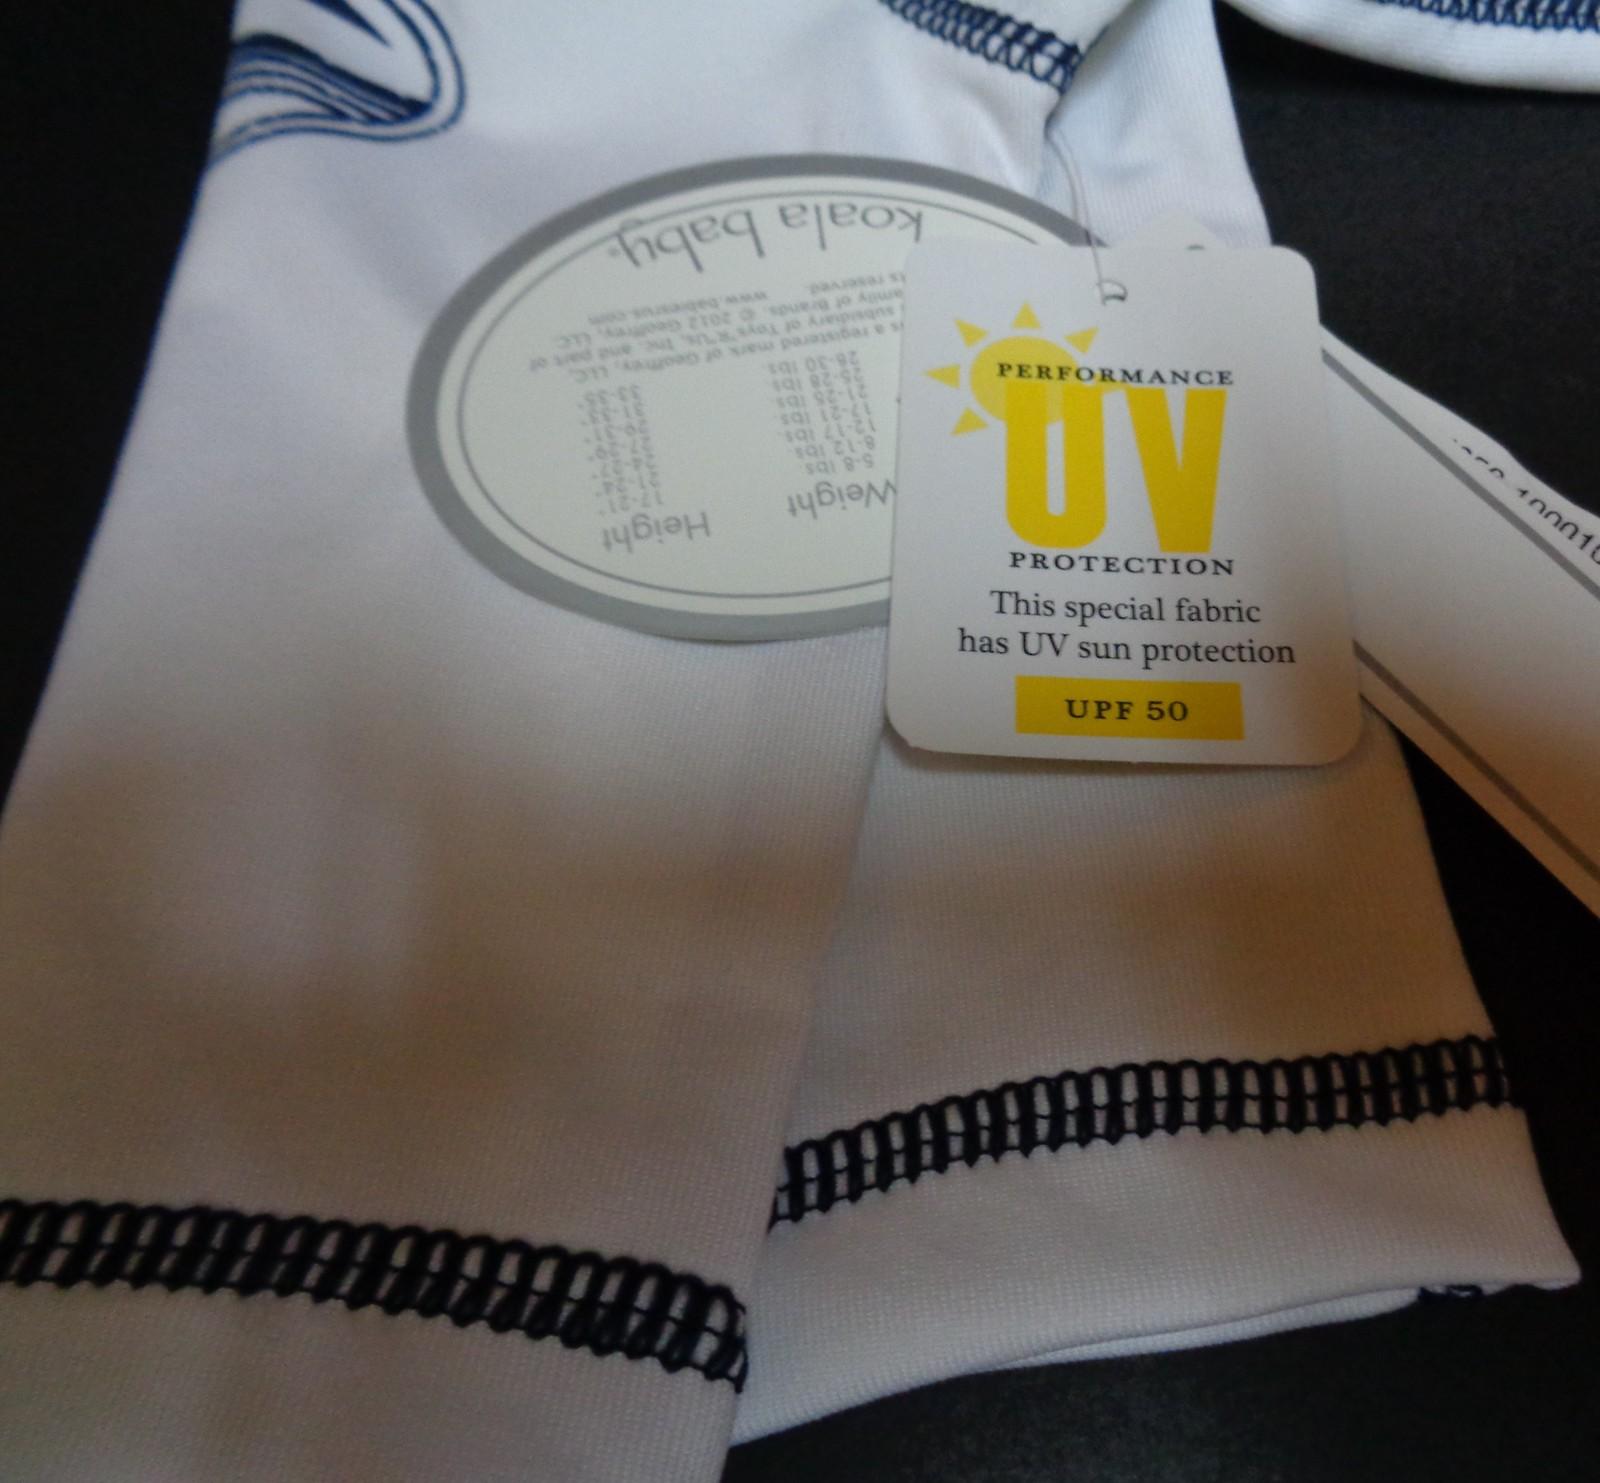 Koala Baby Boys Newborn Swim Shirt NWT White Long Sleeves UV Protection UPF 50